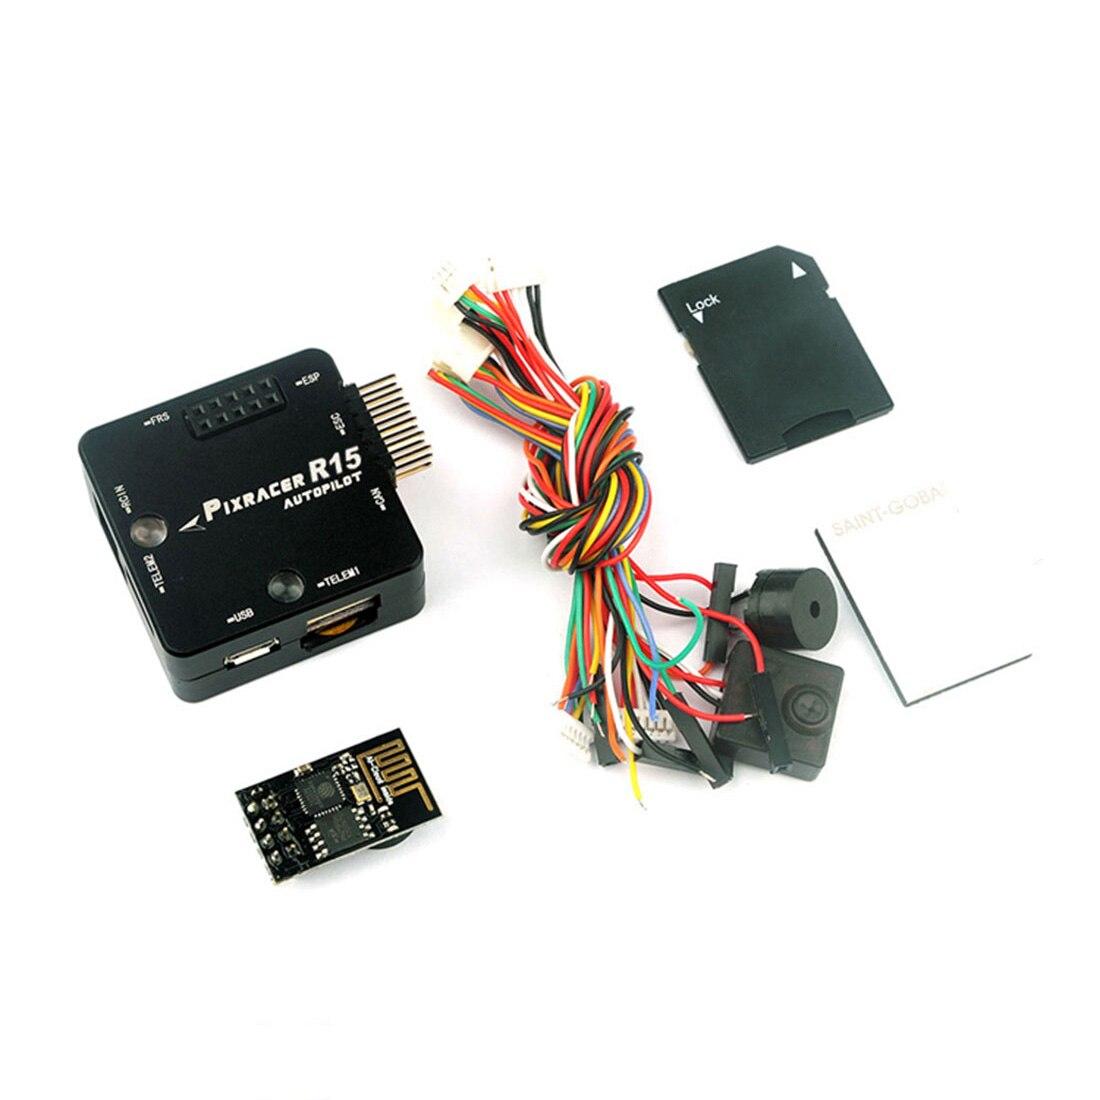 Happymodel Update CNC Metal Shell Mini Pixracer Autopilot Xracer FPU rev.3 PX4 Flight Controller Board for DIY FPV Drone